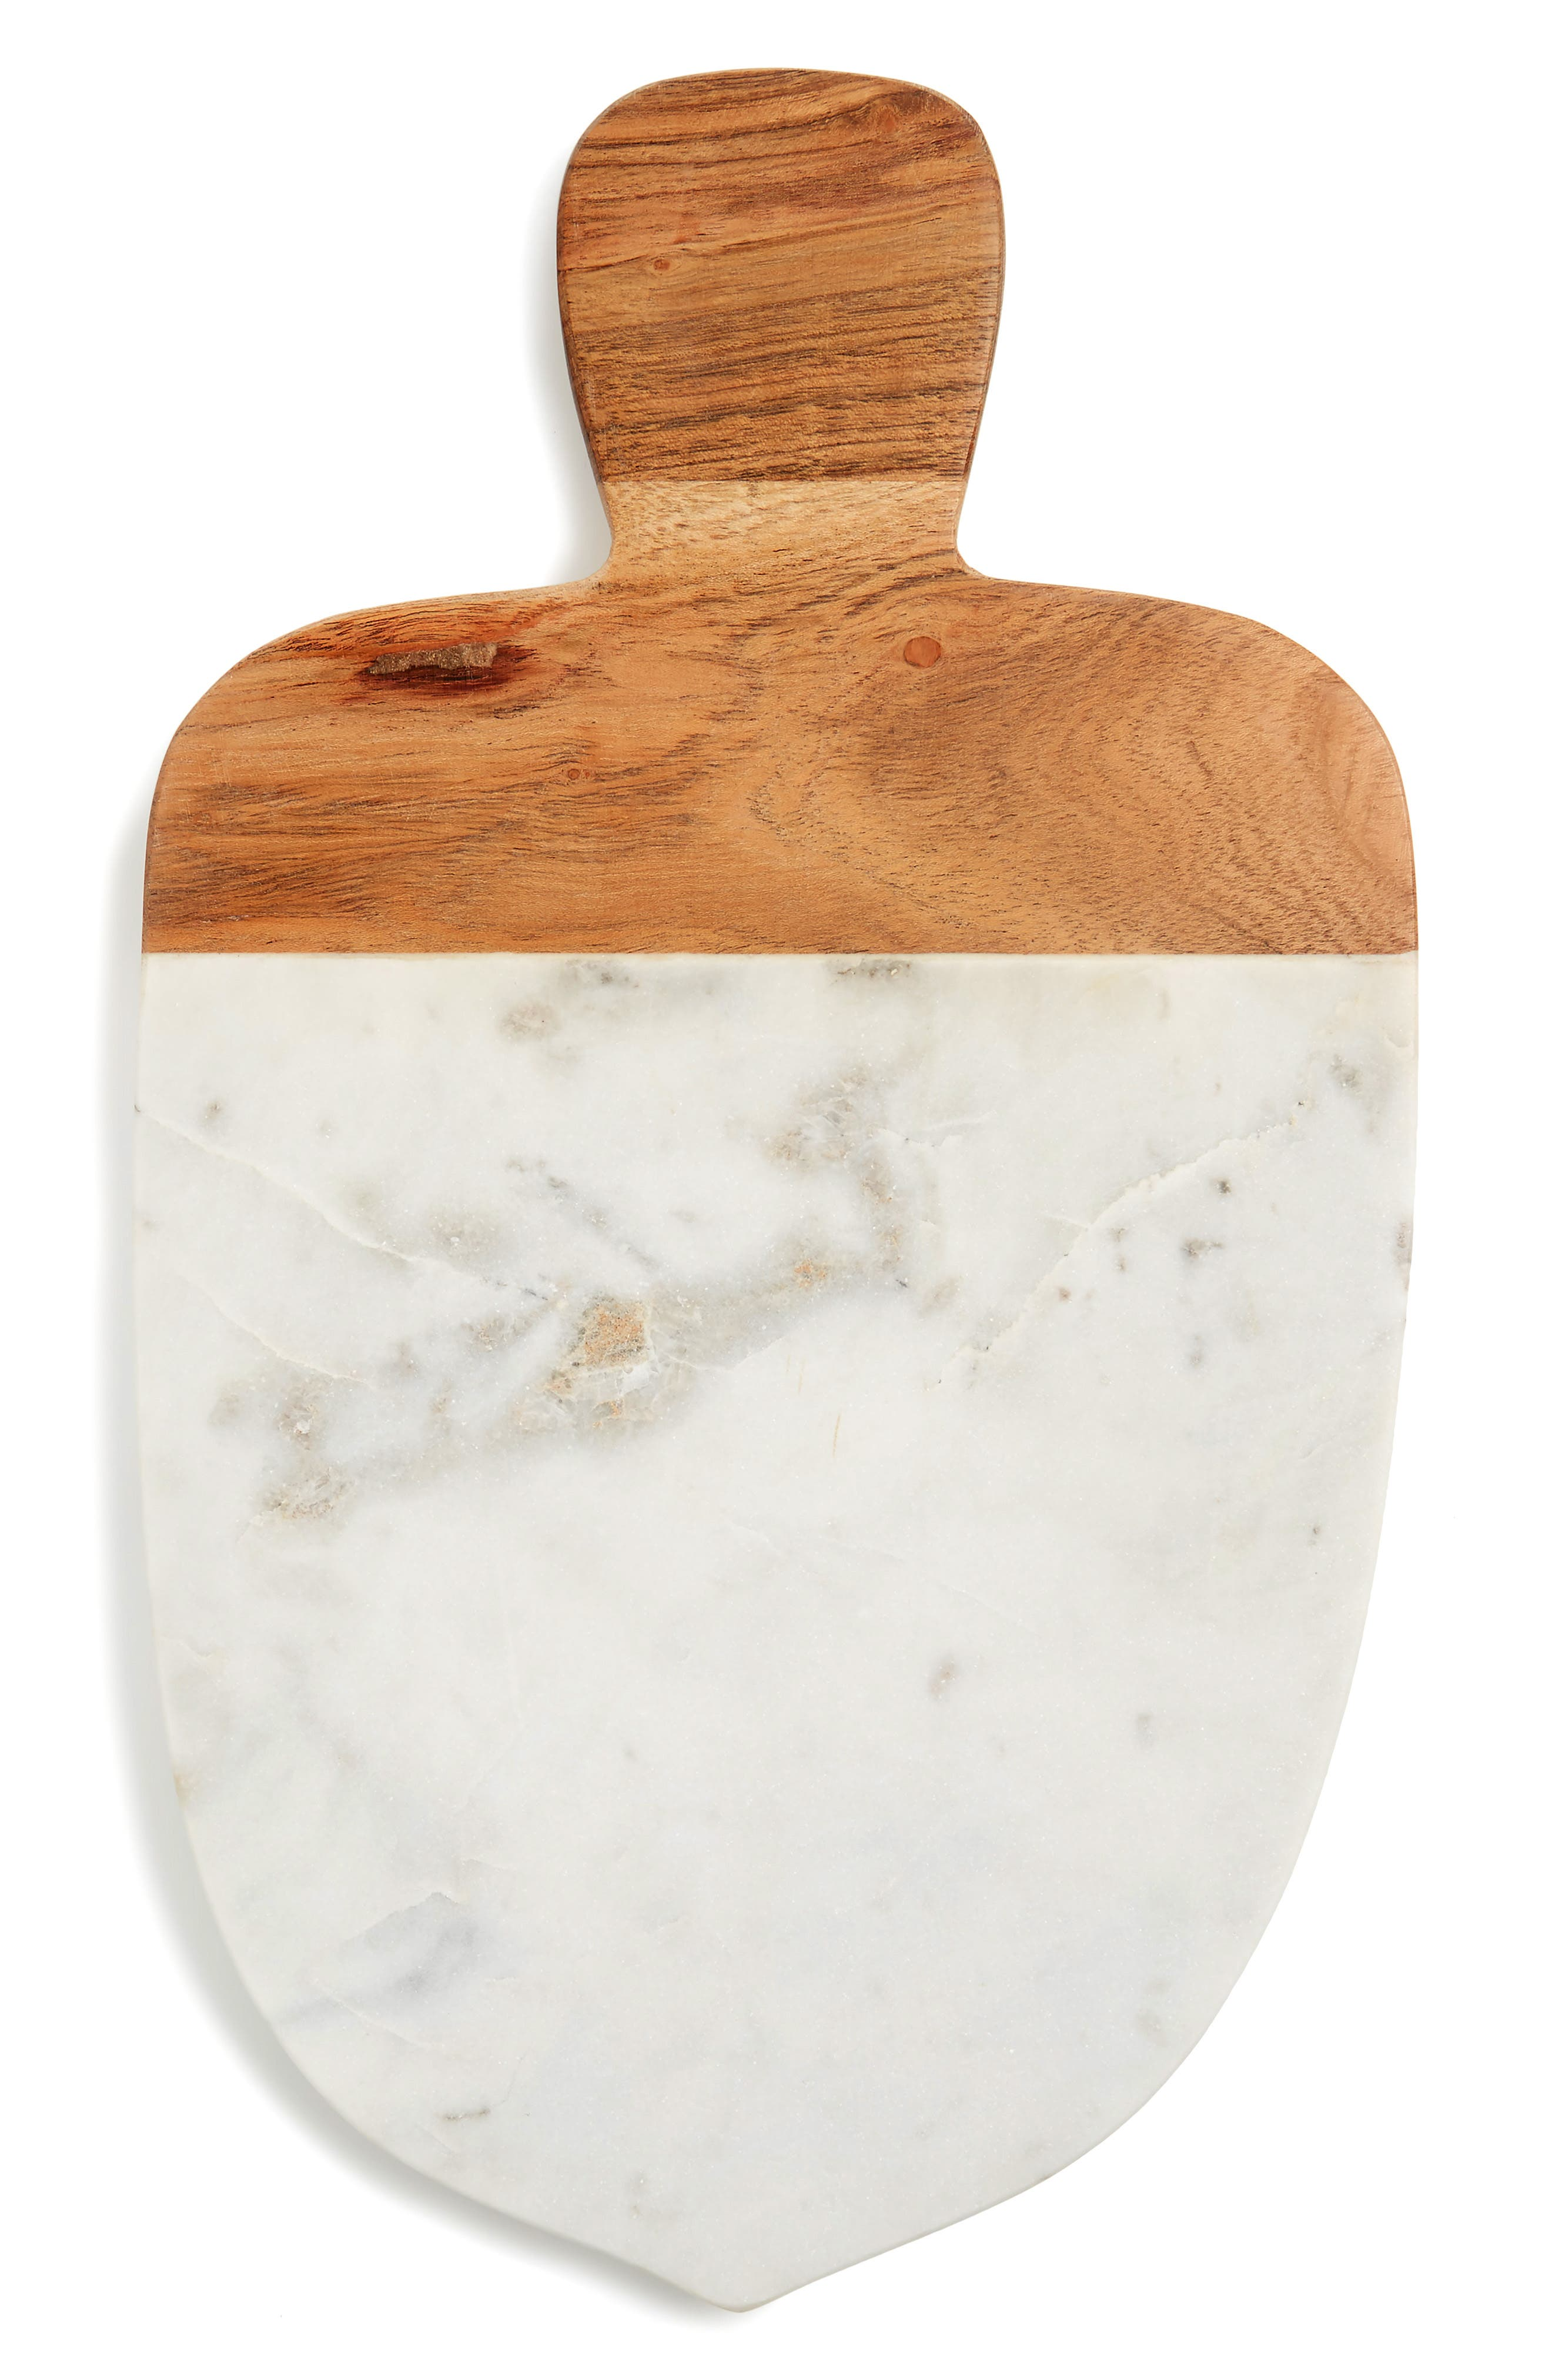 Marble Acorn Cutting Board,                         Main,                         color, White Multi